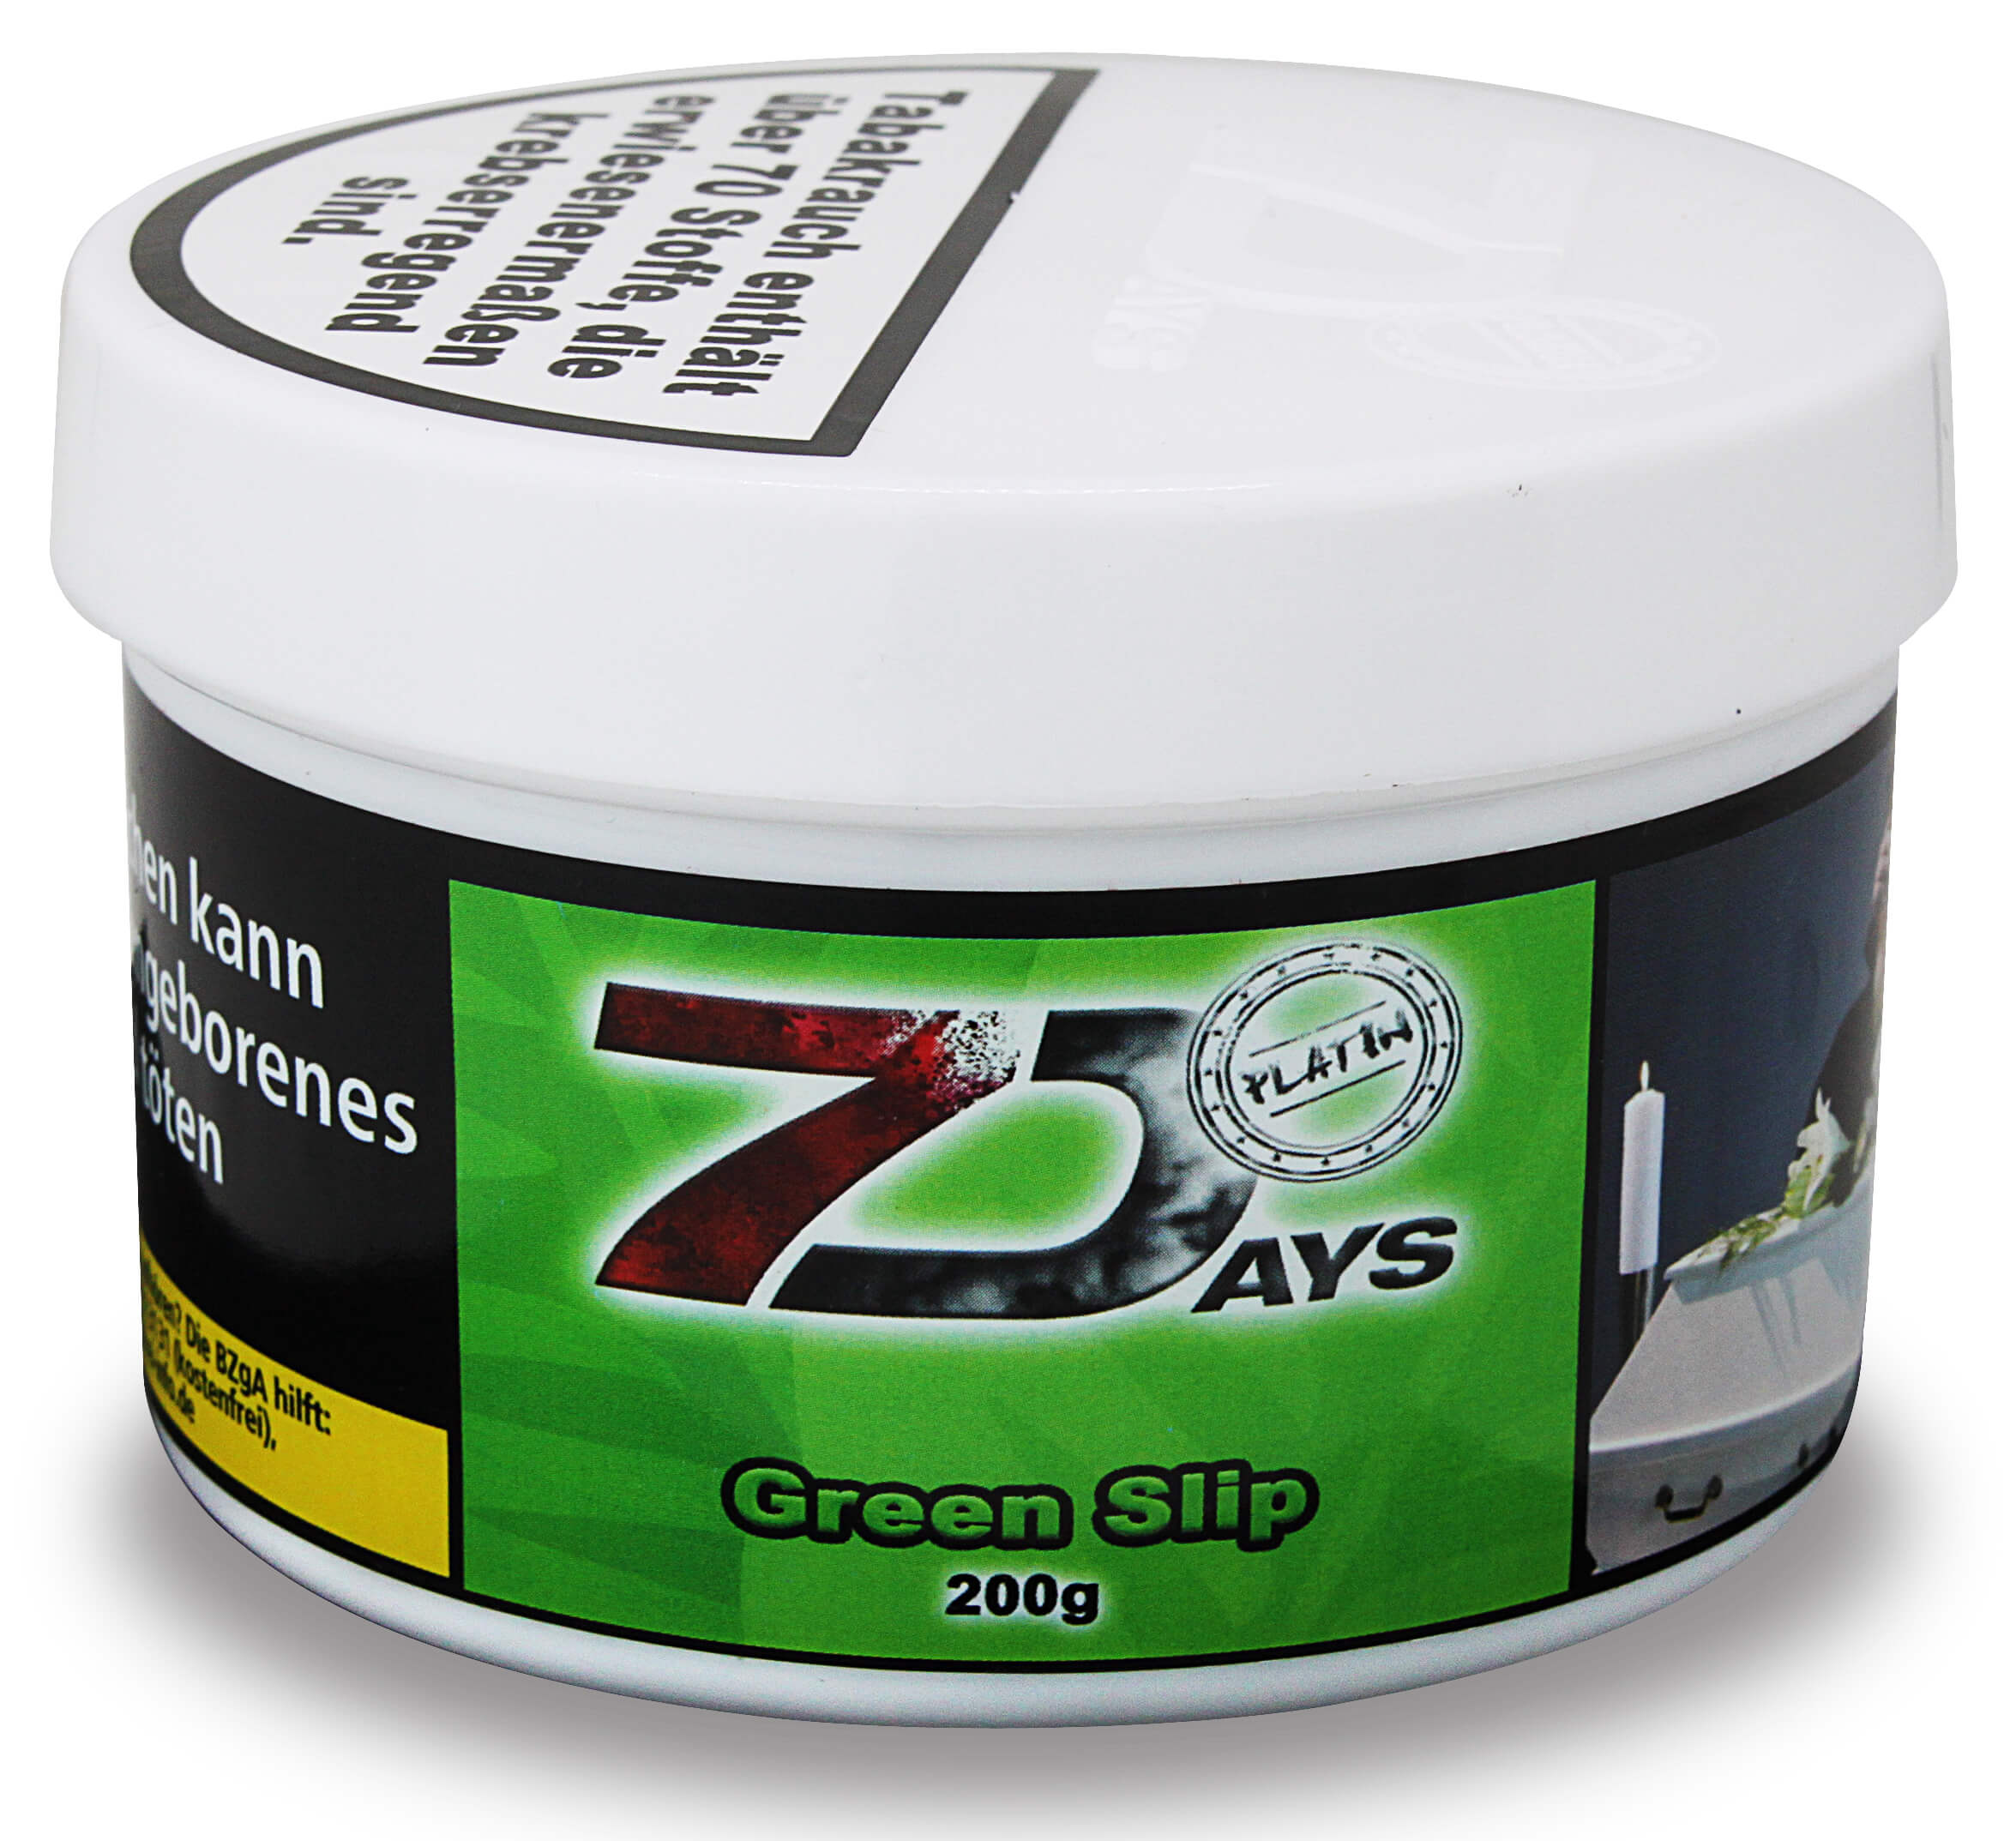 7 Days Platin Tabak - Green Slip 200g